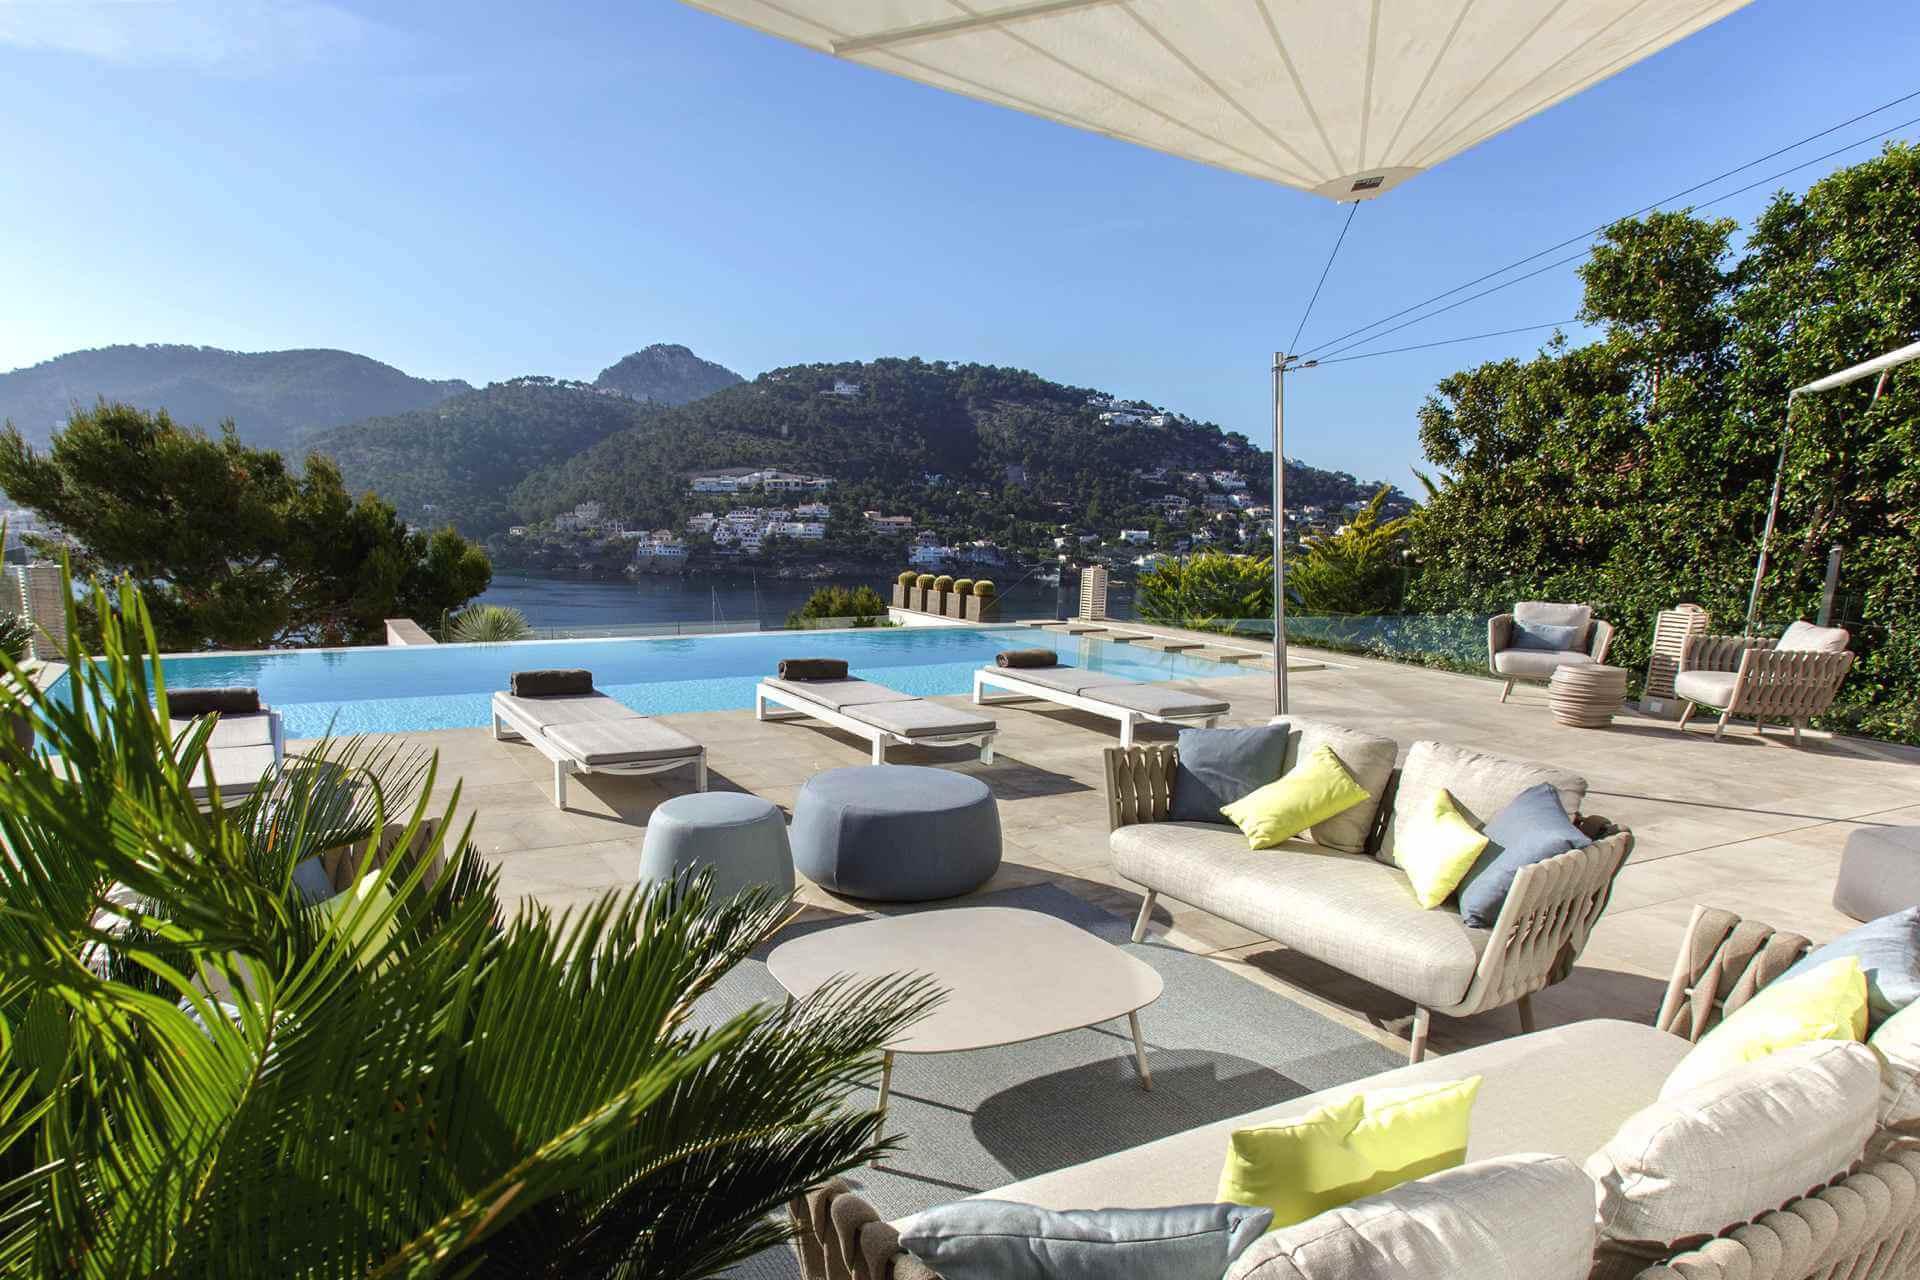 01-353 Villa with indoor pool Mallorca Southwest Bild 3